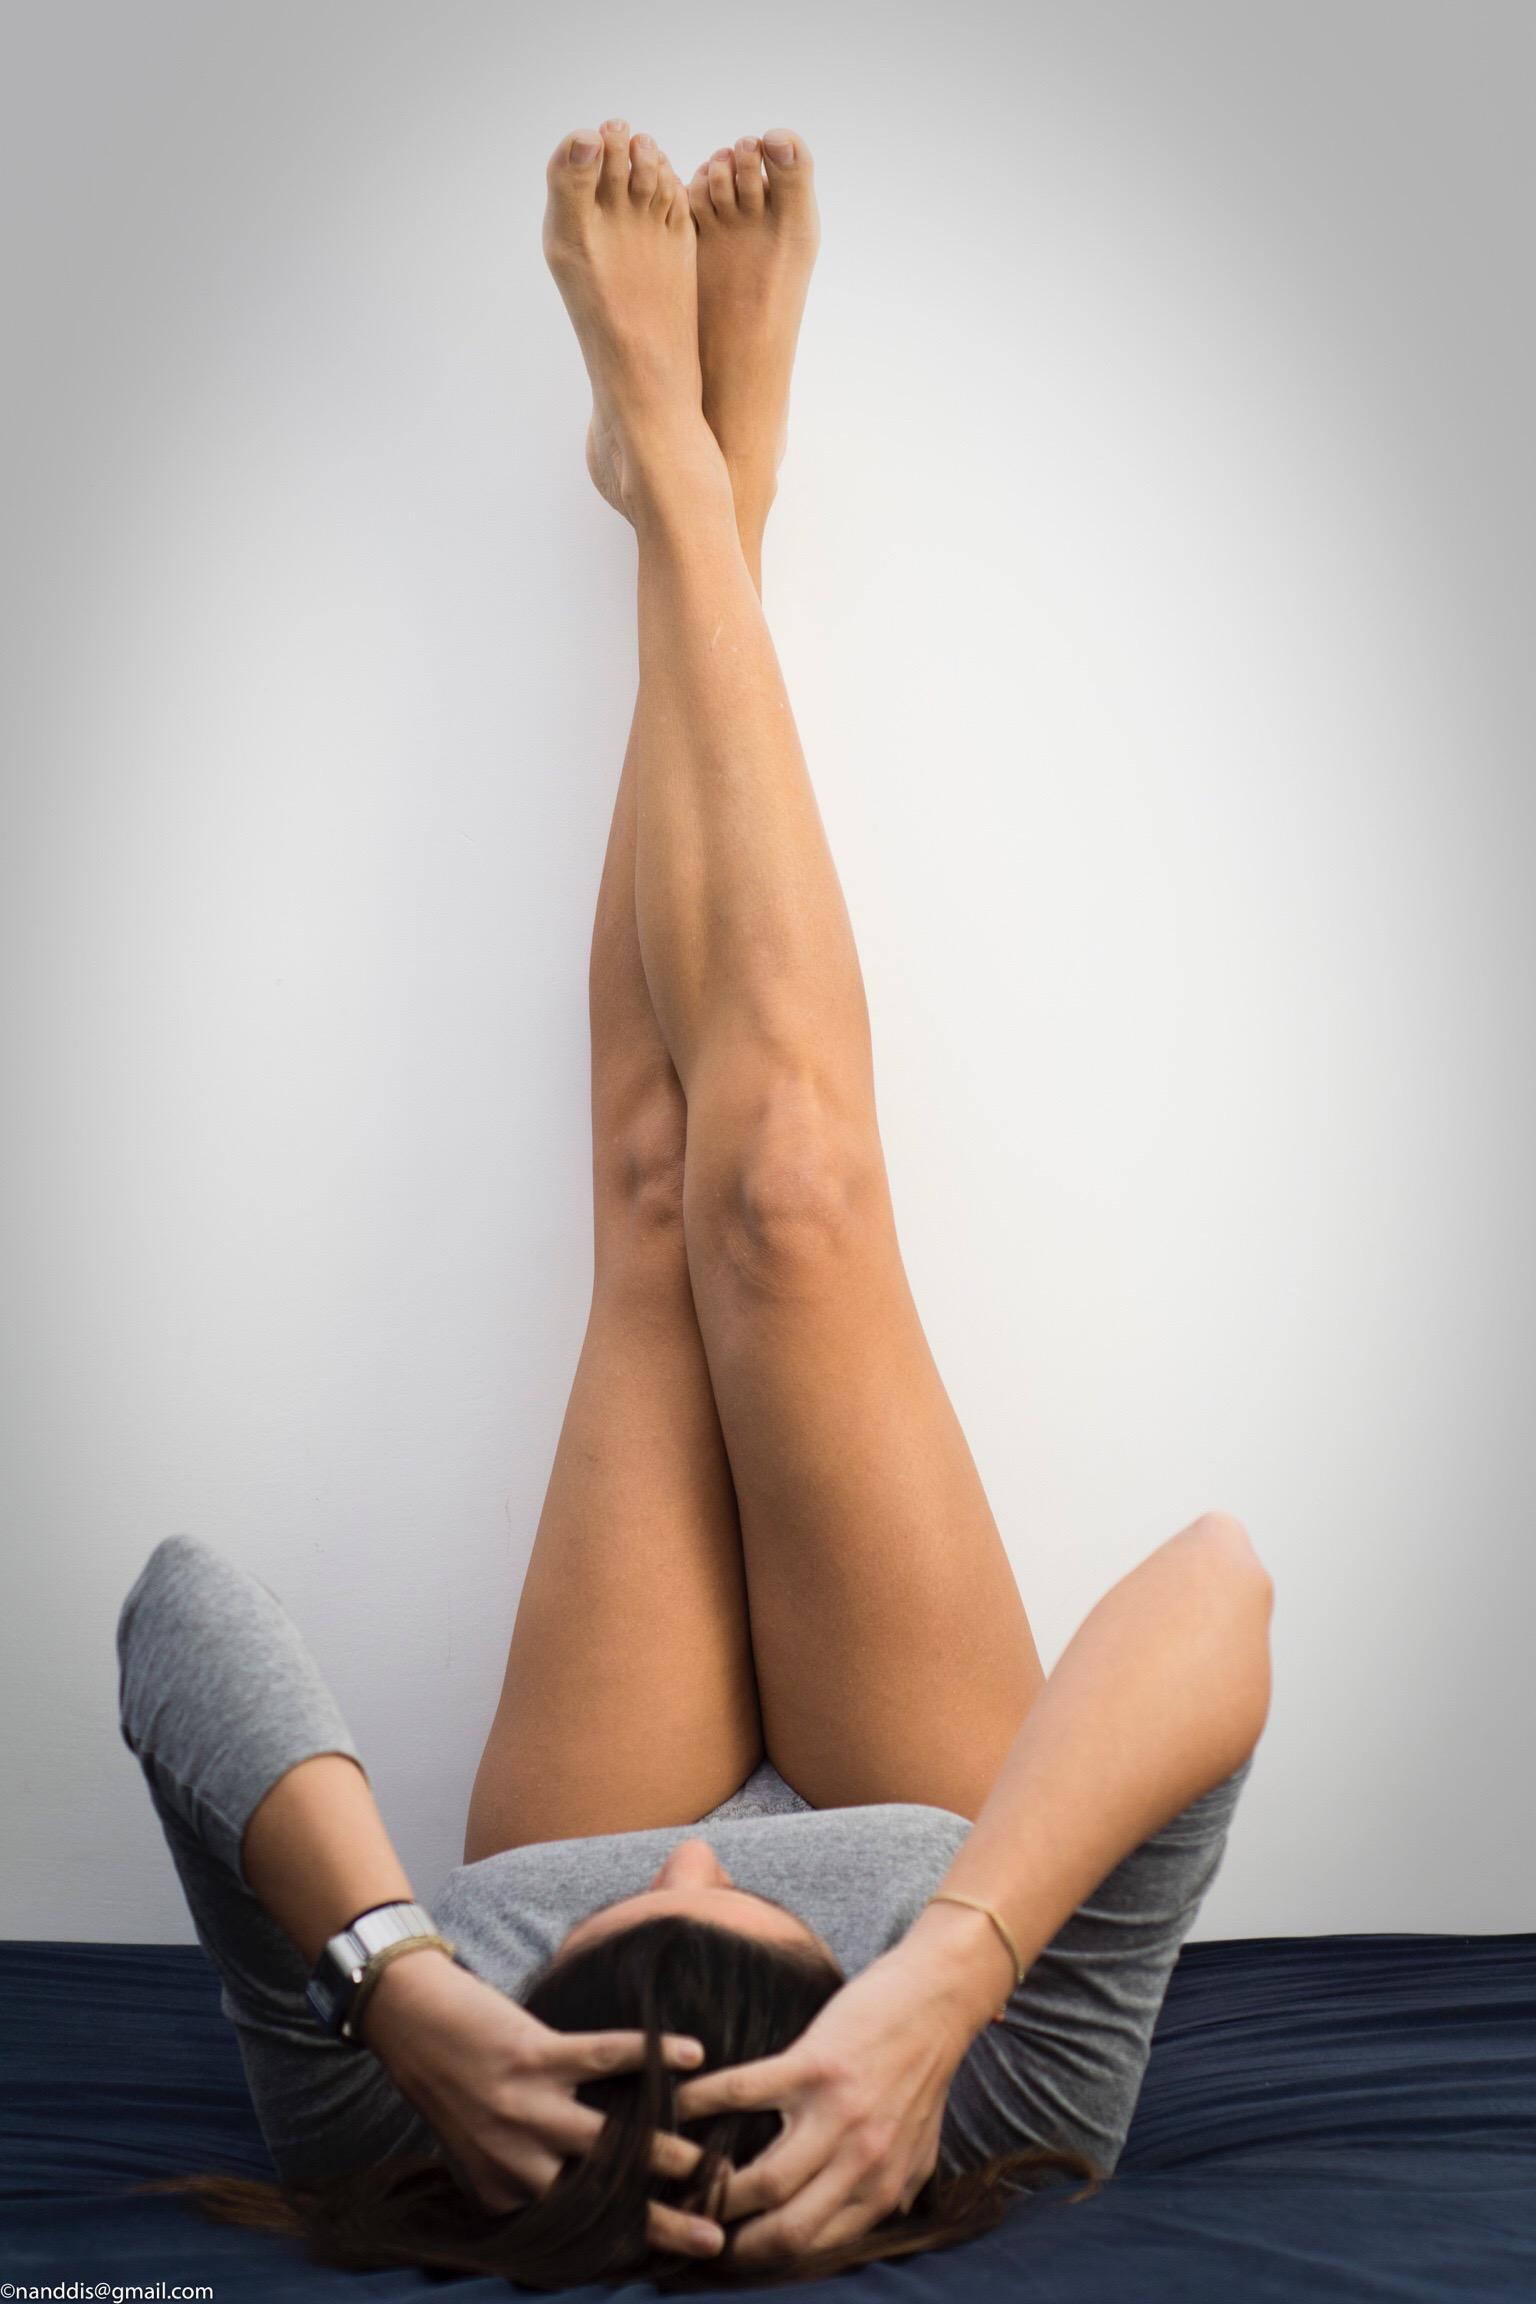 depilación láser piernas